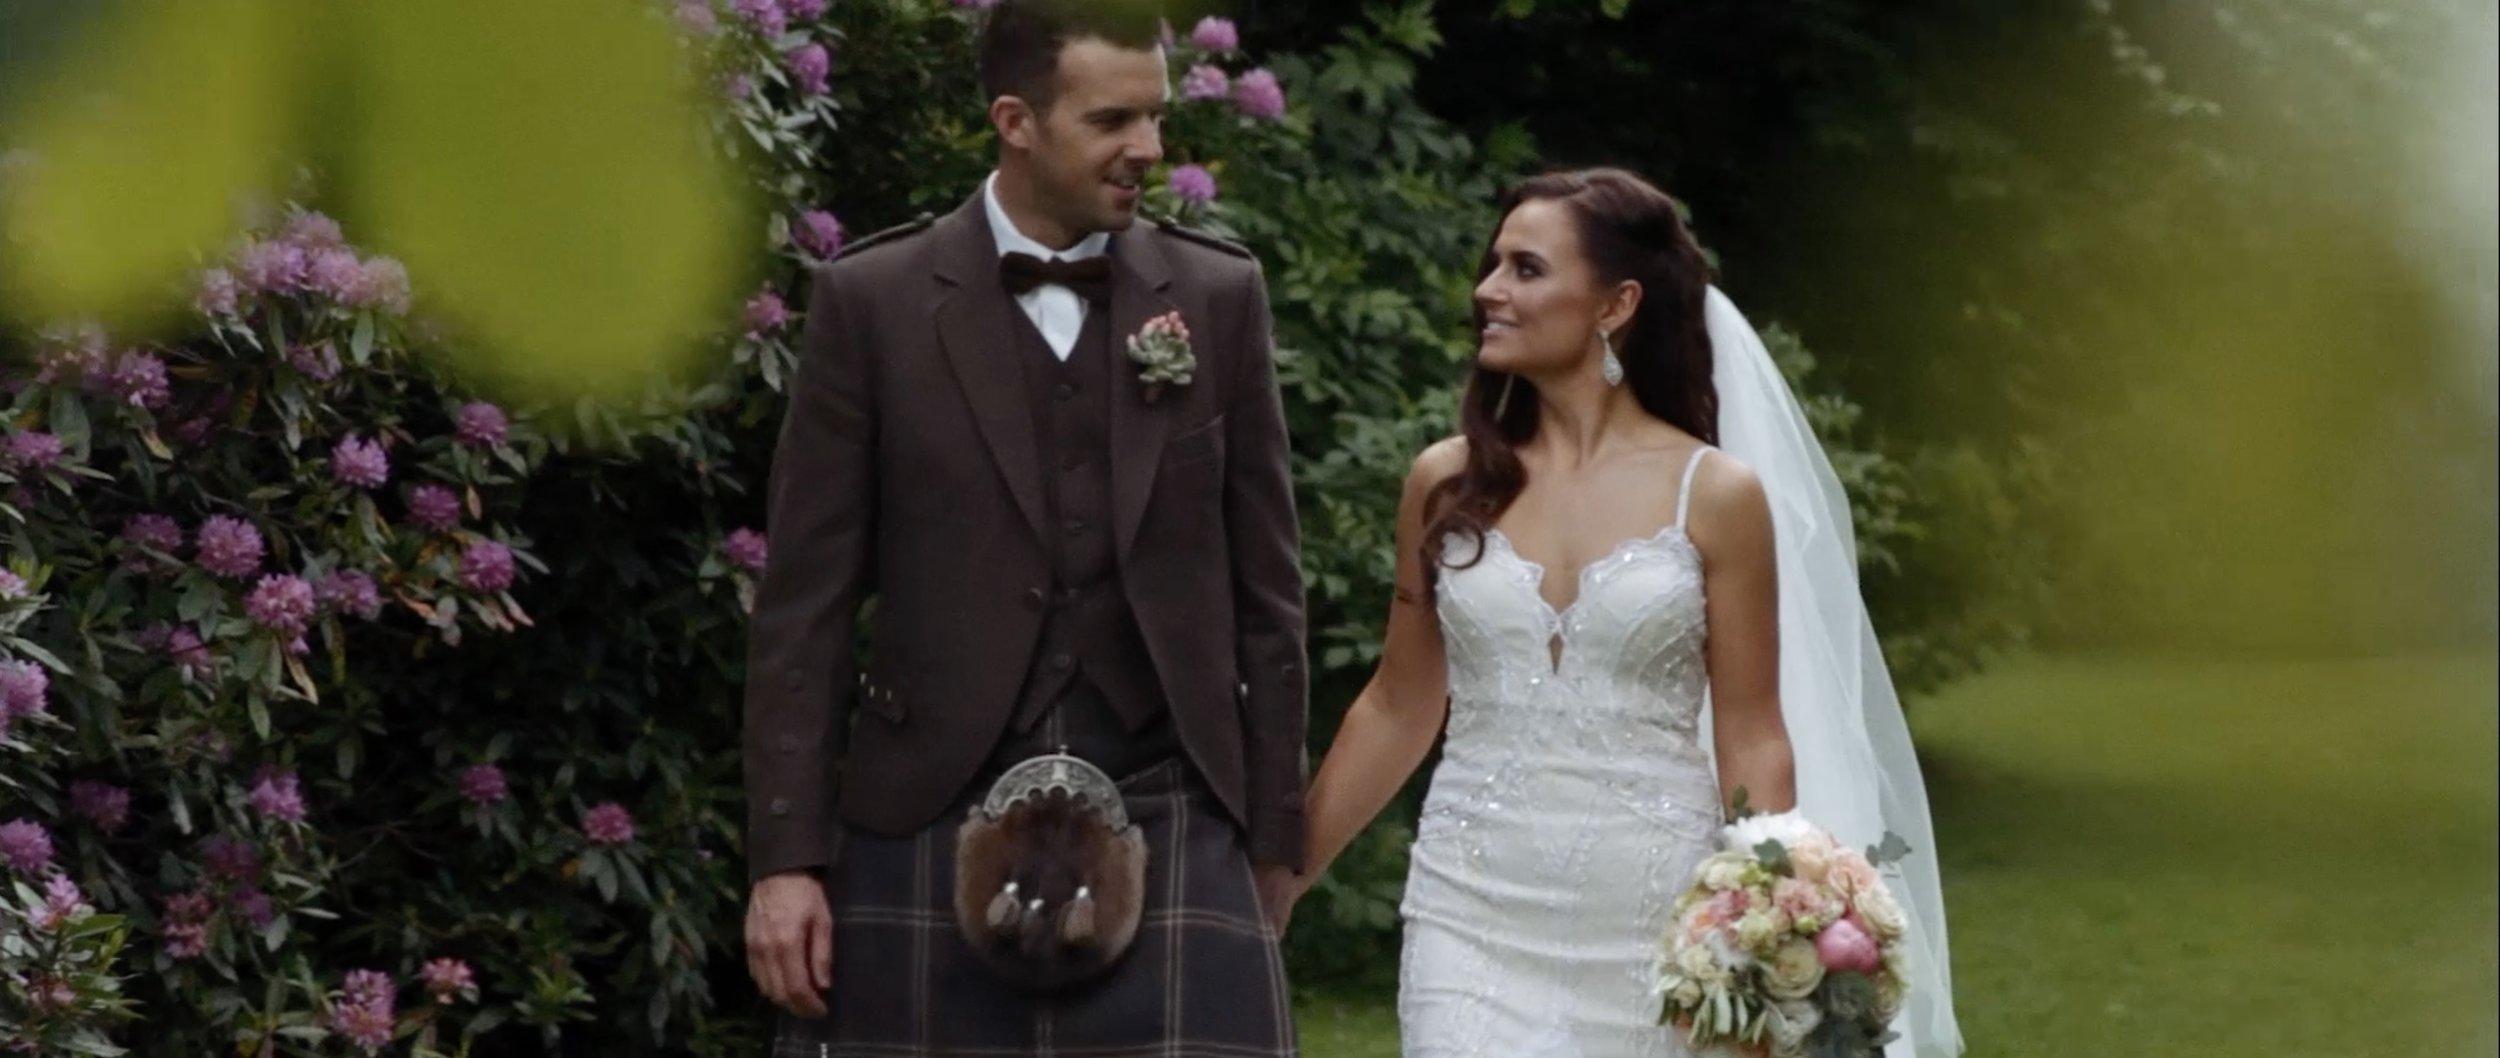 rowallan-castle-wedding-videographer_LL_06.jpg